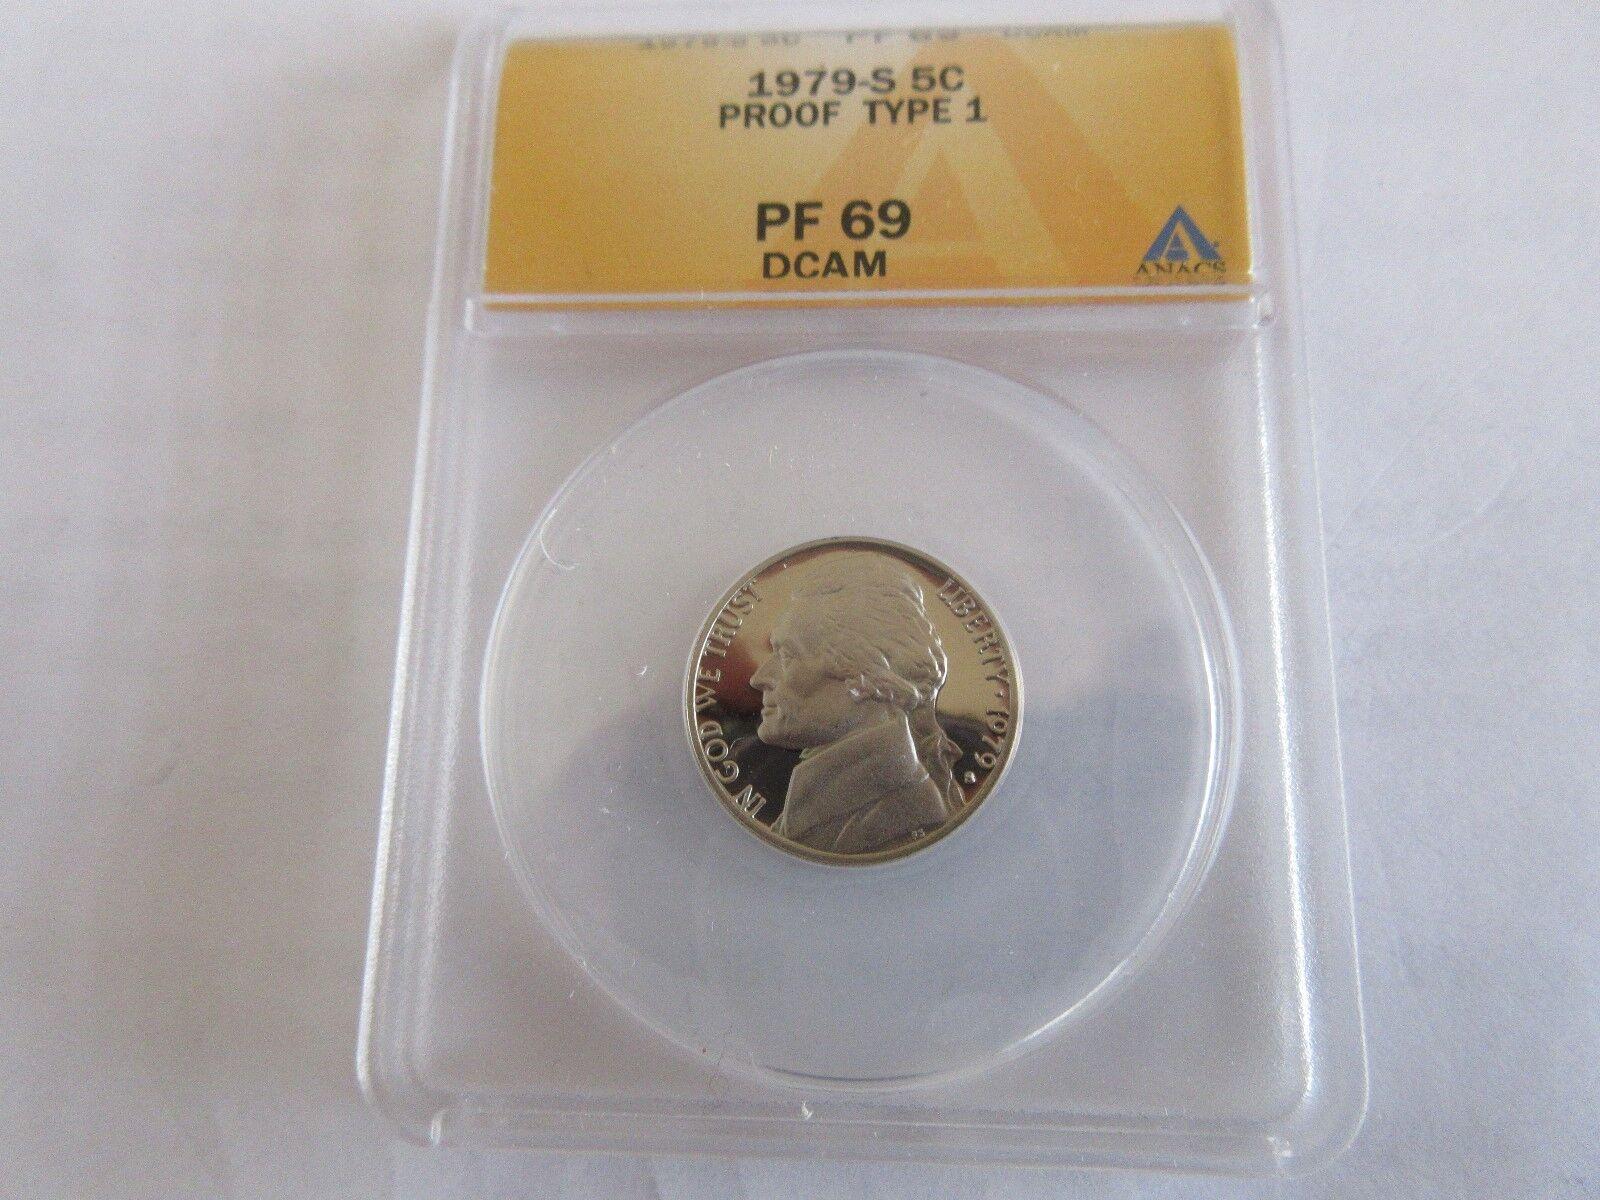 1979-S , Jefferson 5 Cents , Proof Type 1 , DCAM , ANAC